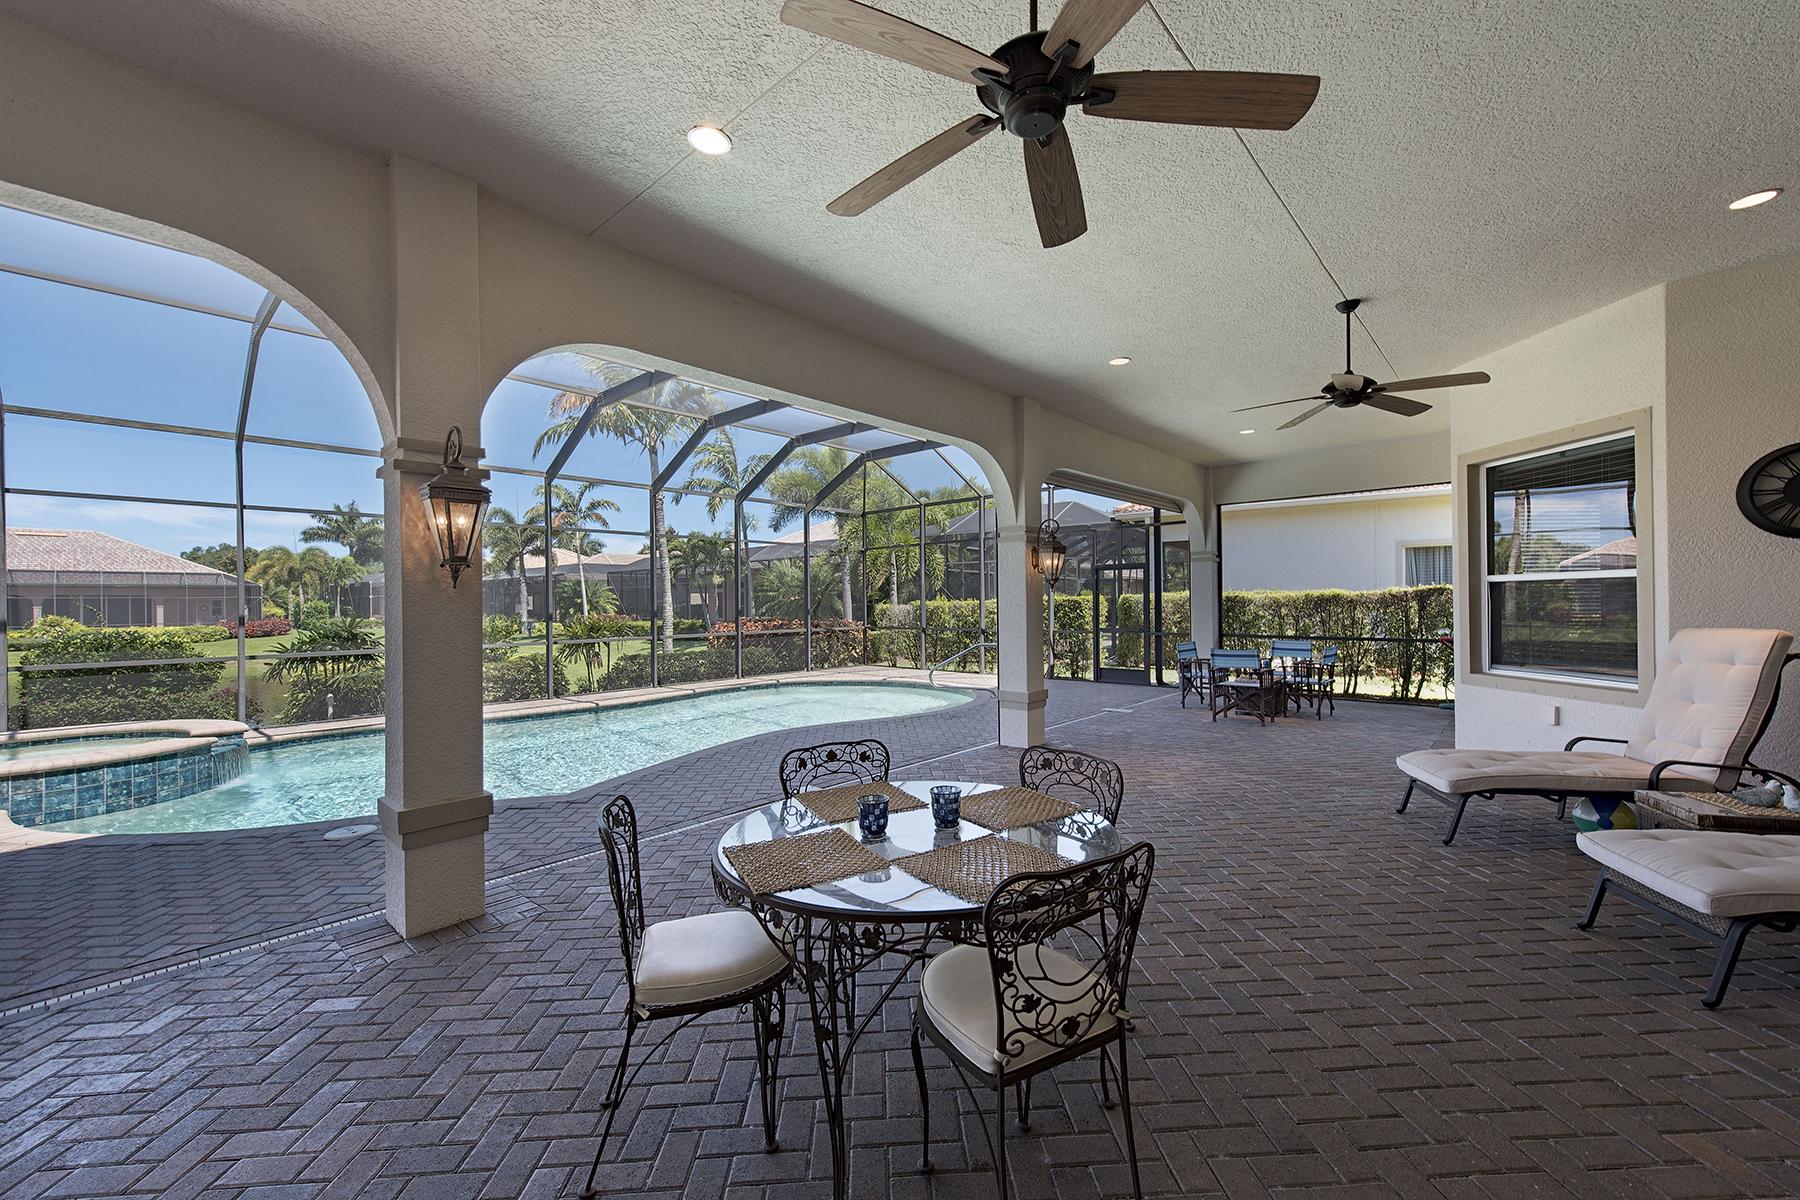 Casa para uma família para Venda às VINEYARDS - HAMMOCK ISLES 5678 Sago Ct Naples, Florida, 34119 Estados Unidos